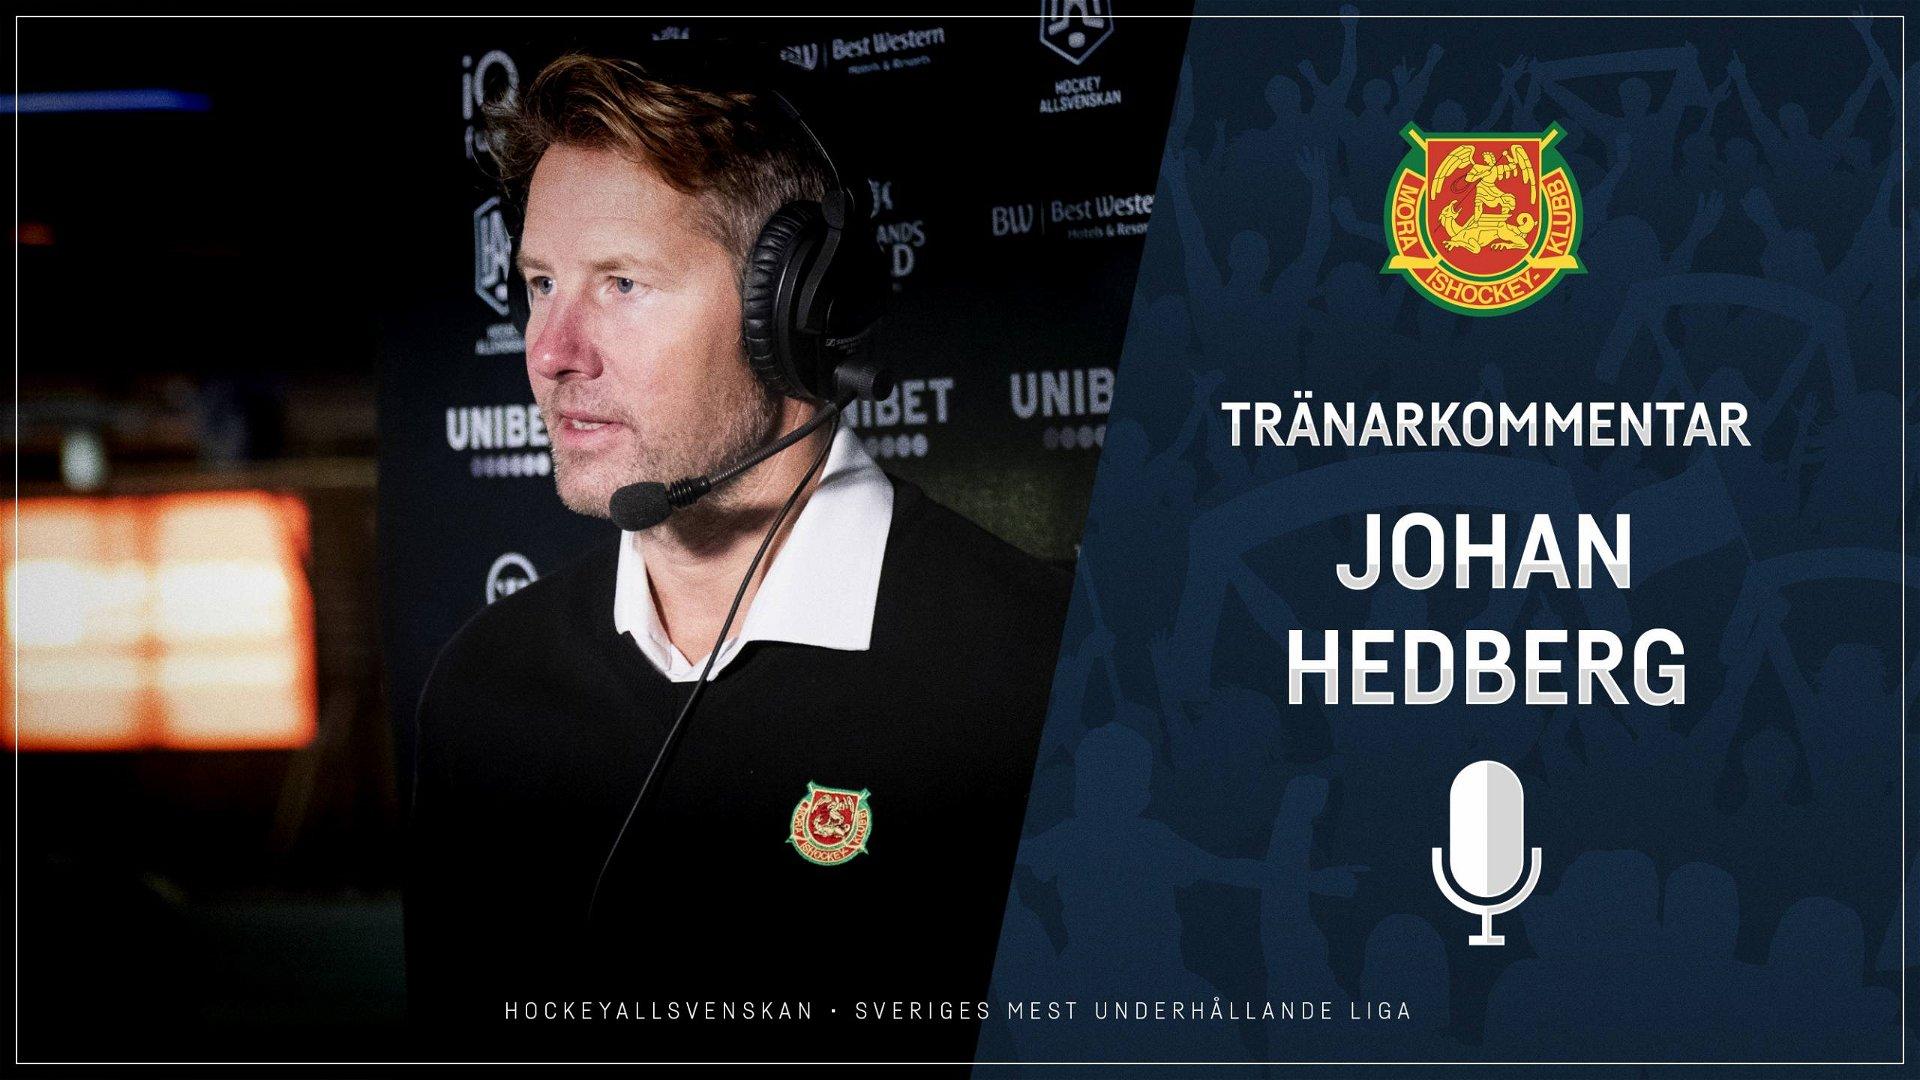 2021-03-02 Segerintervju: Johan Hedberg